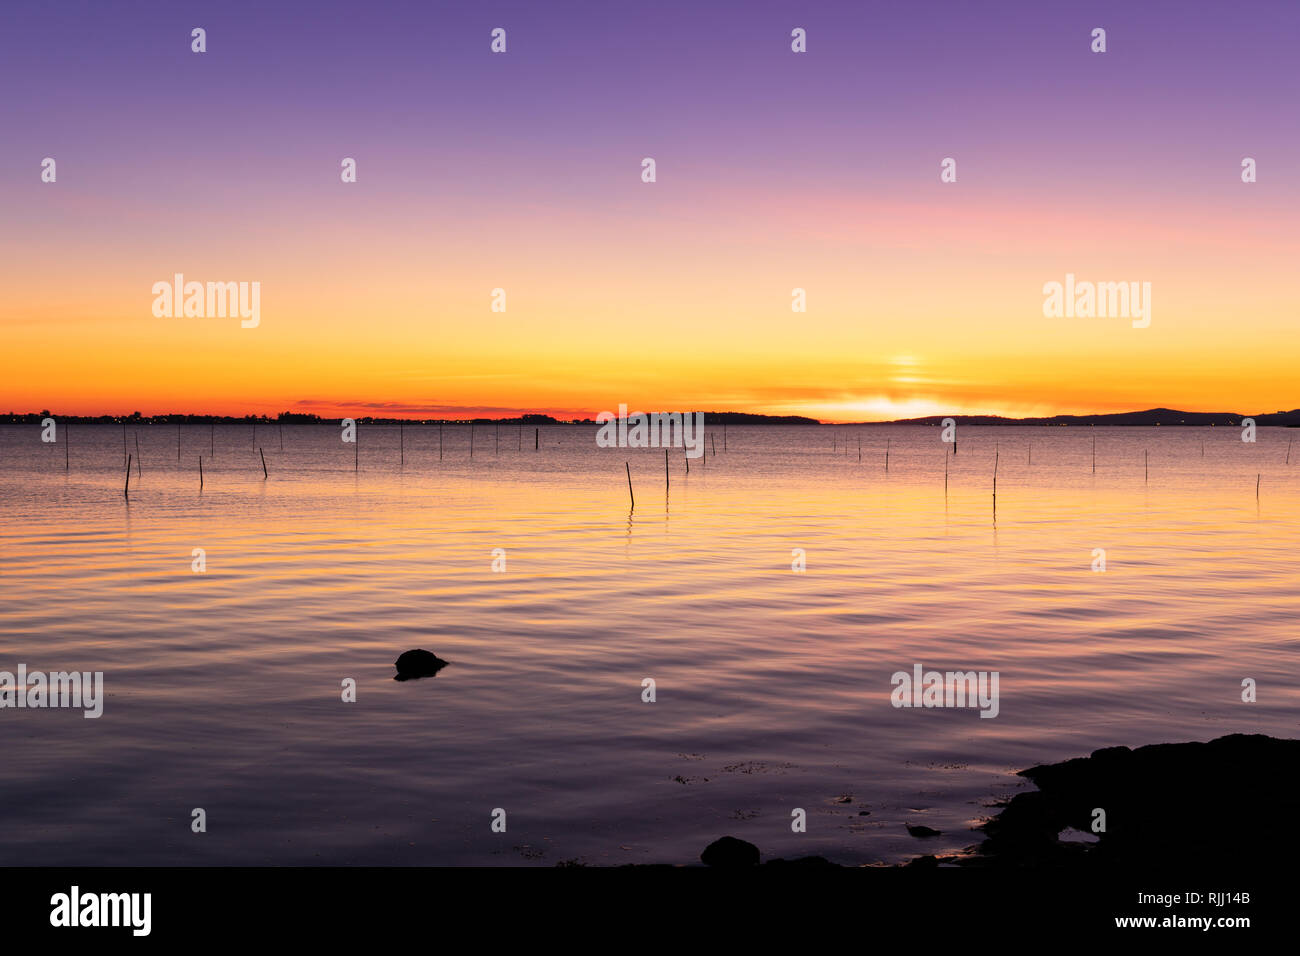 Beach sunset with calm sea scene in Galicia, Spain. Beautiful marine landscape - Stock Image